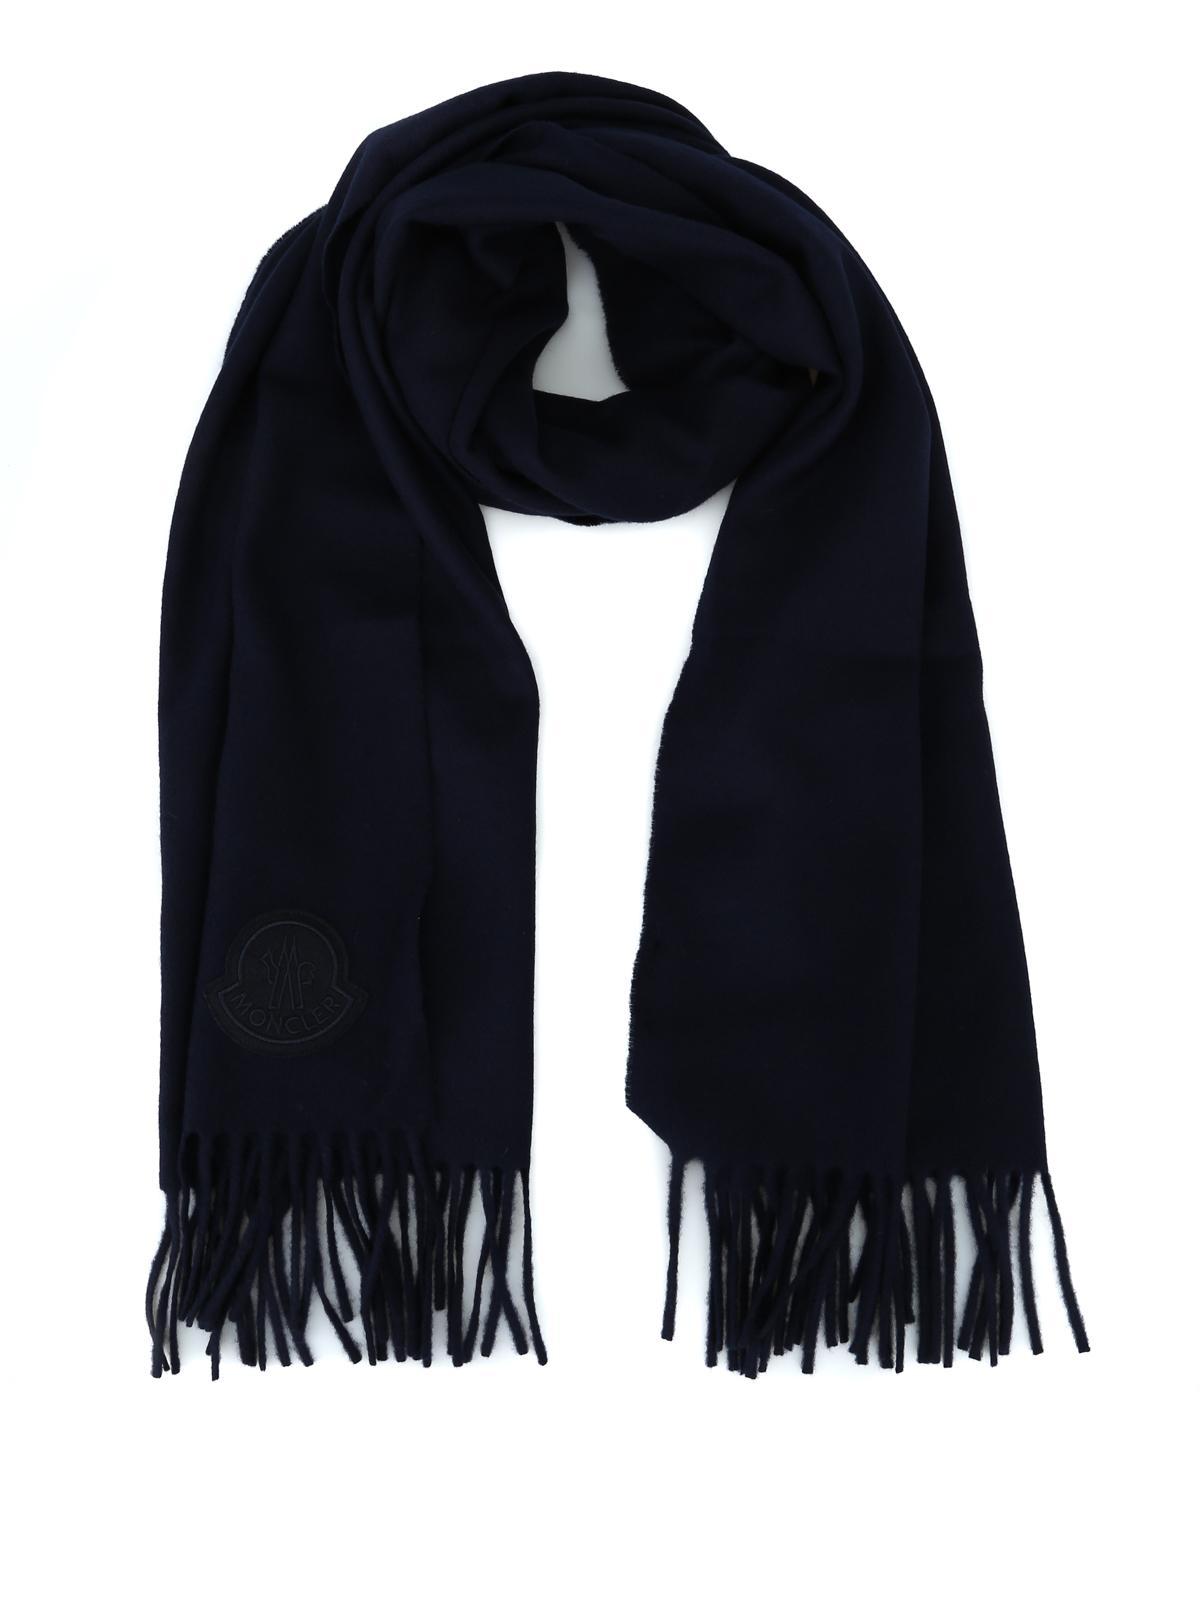 Moncler - Blue fringed wool cloth scarf - scarves - D2 091 0086400 ... 6eba7e234d39